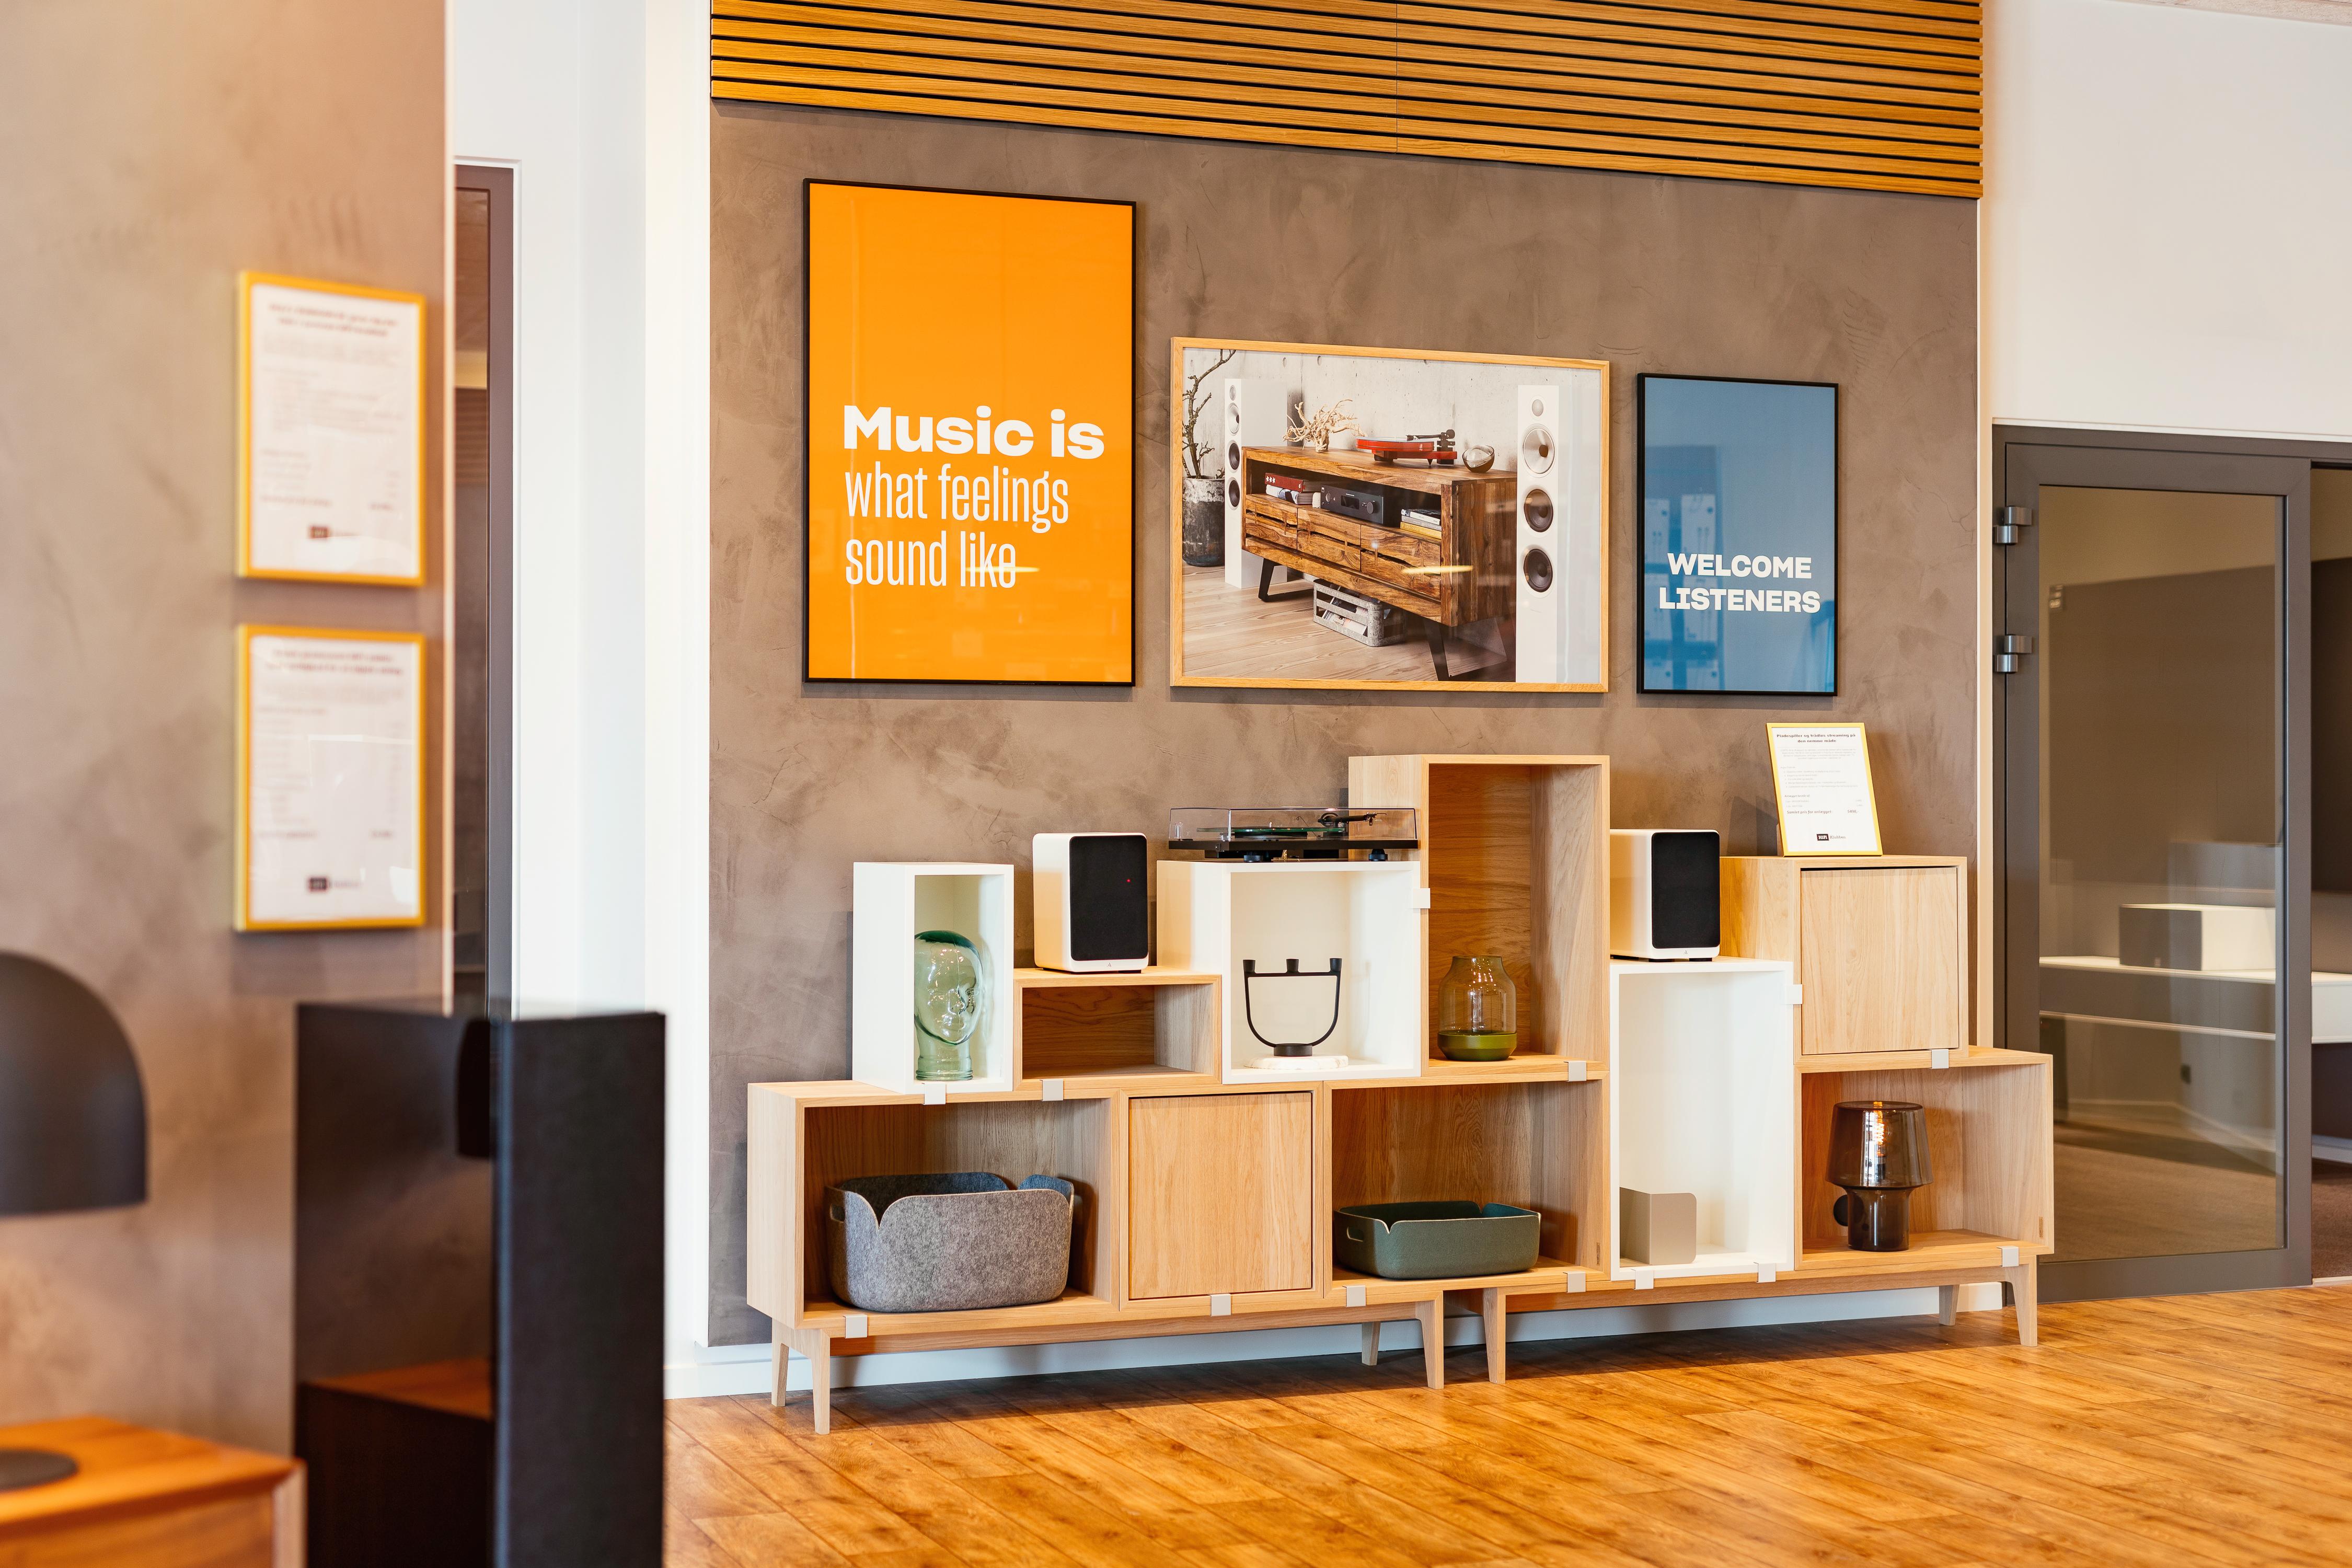 Ny-butik_Aalborg (13).jpg